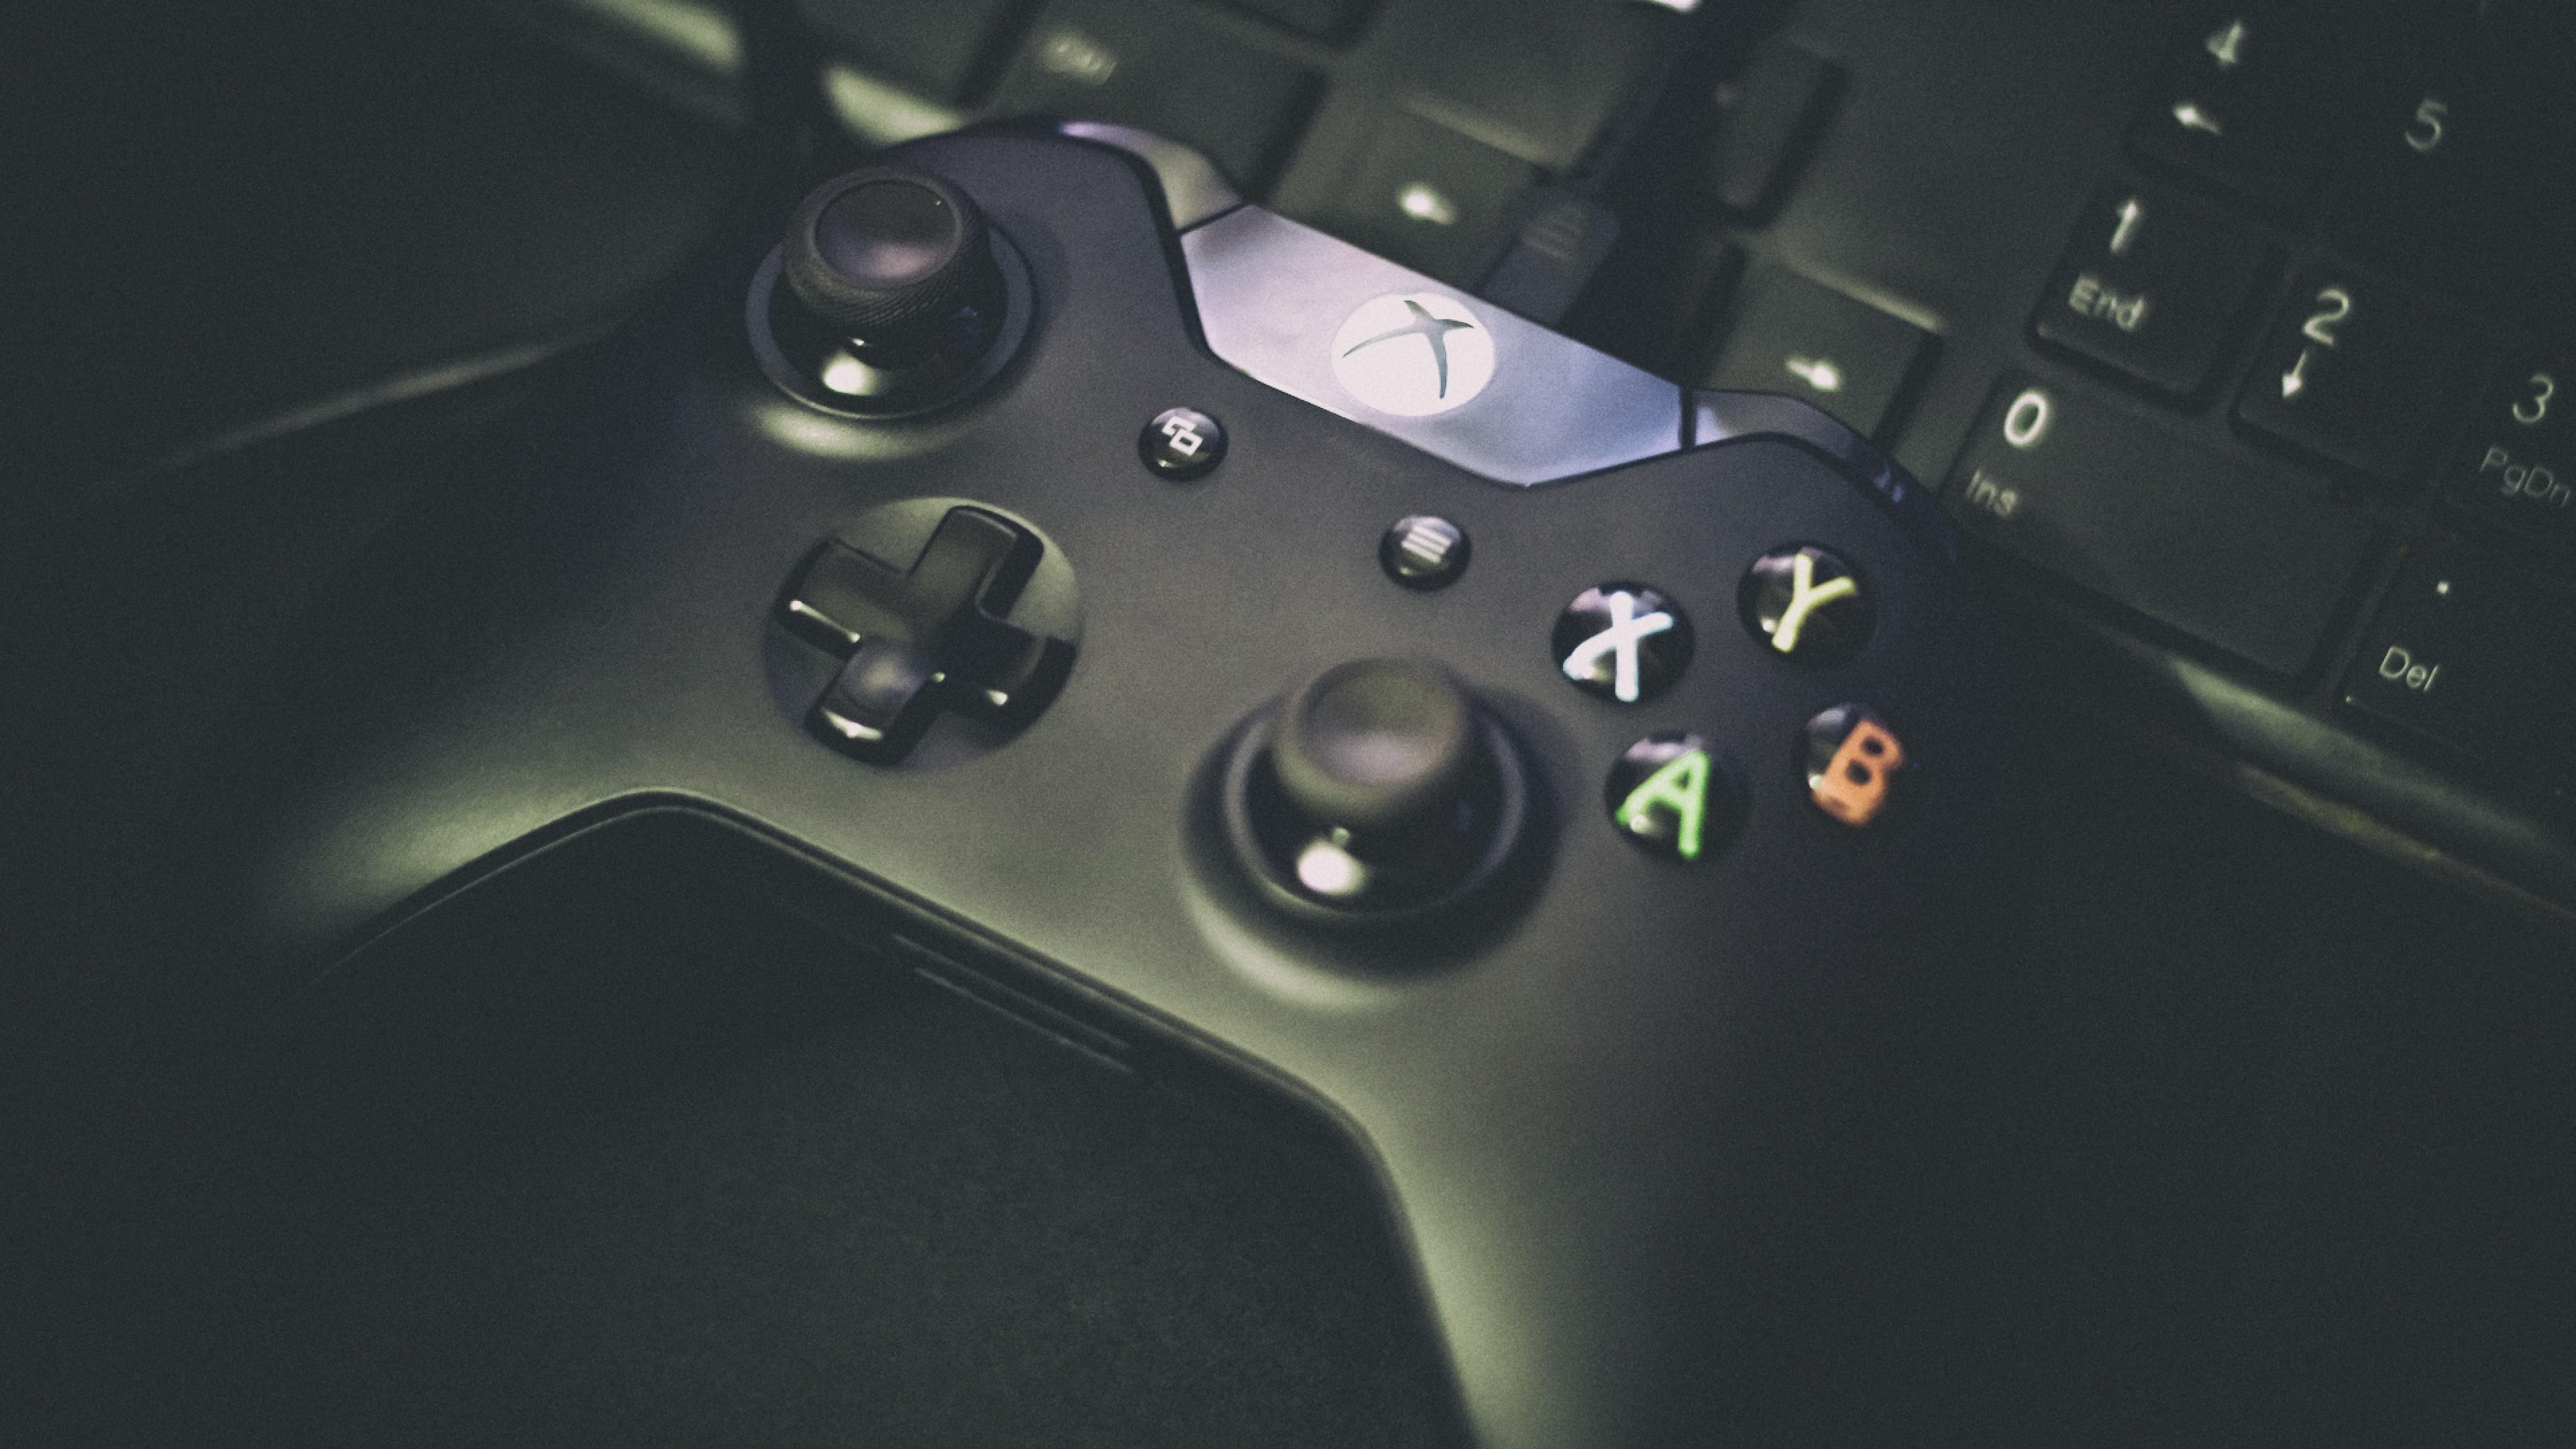 4K Ultra HD Xbox one Wallpapers HD, Desktop Backgrounds 3840×2160